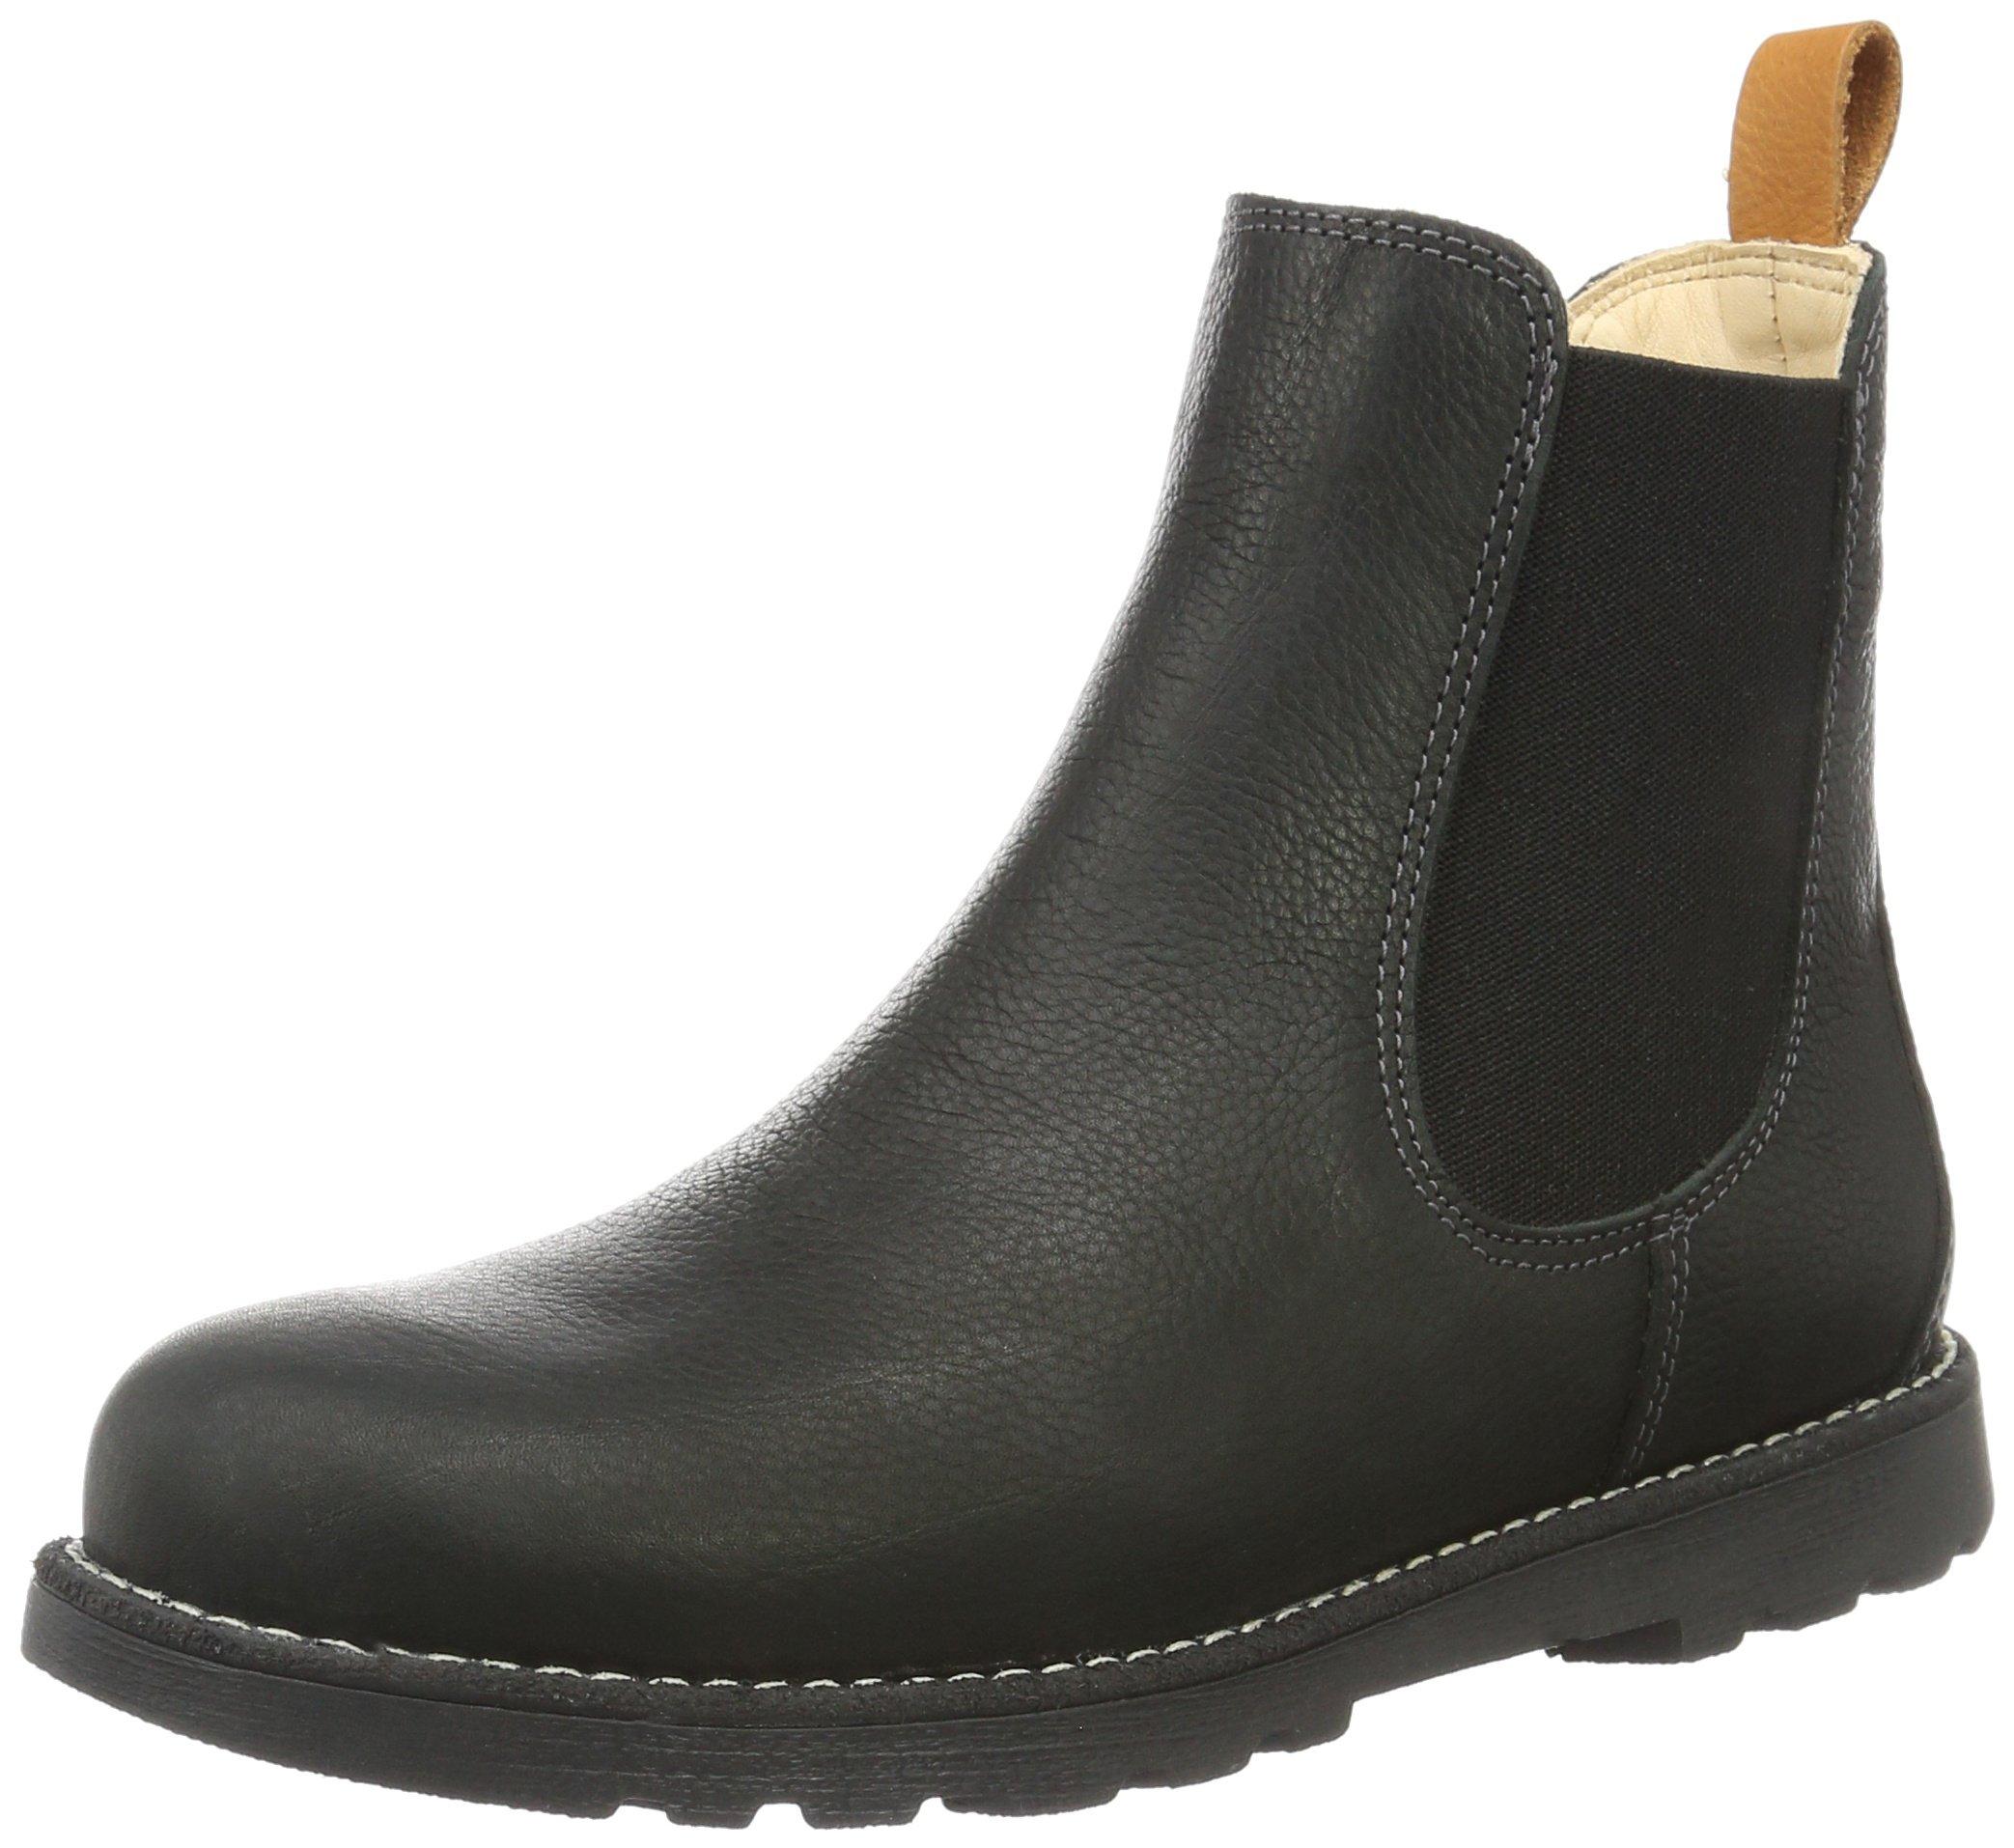 Boots BodåsChelsea 91136 Eu Kavat FemmeNoirblack Aj5Rq34L